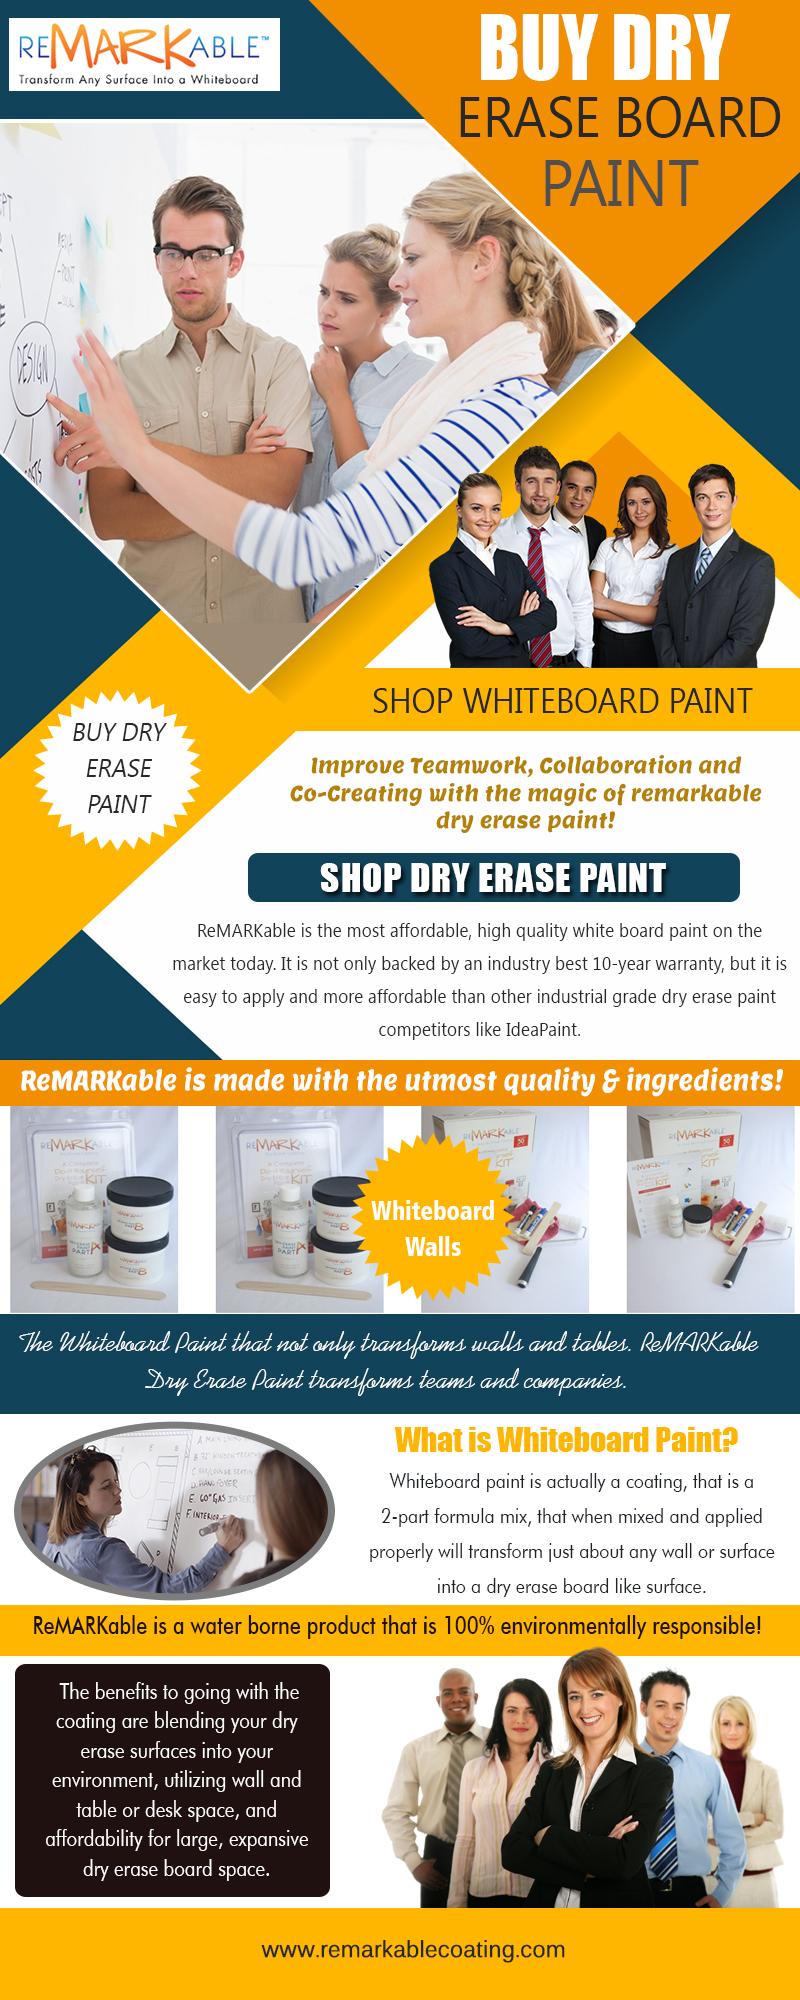 Buy Dry Erase Board Paint